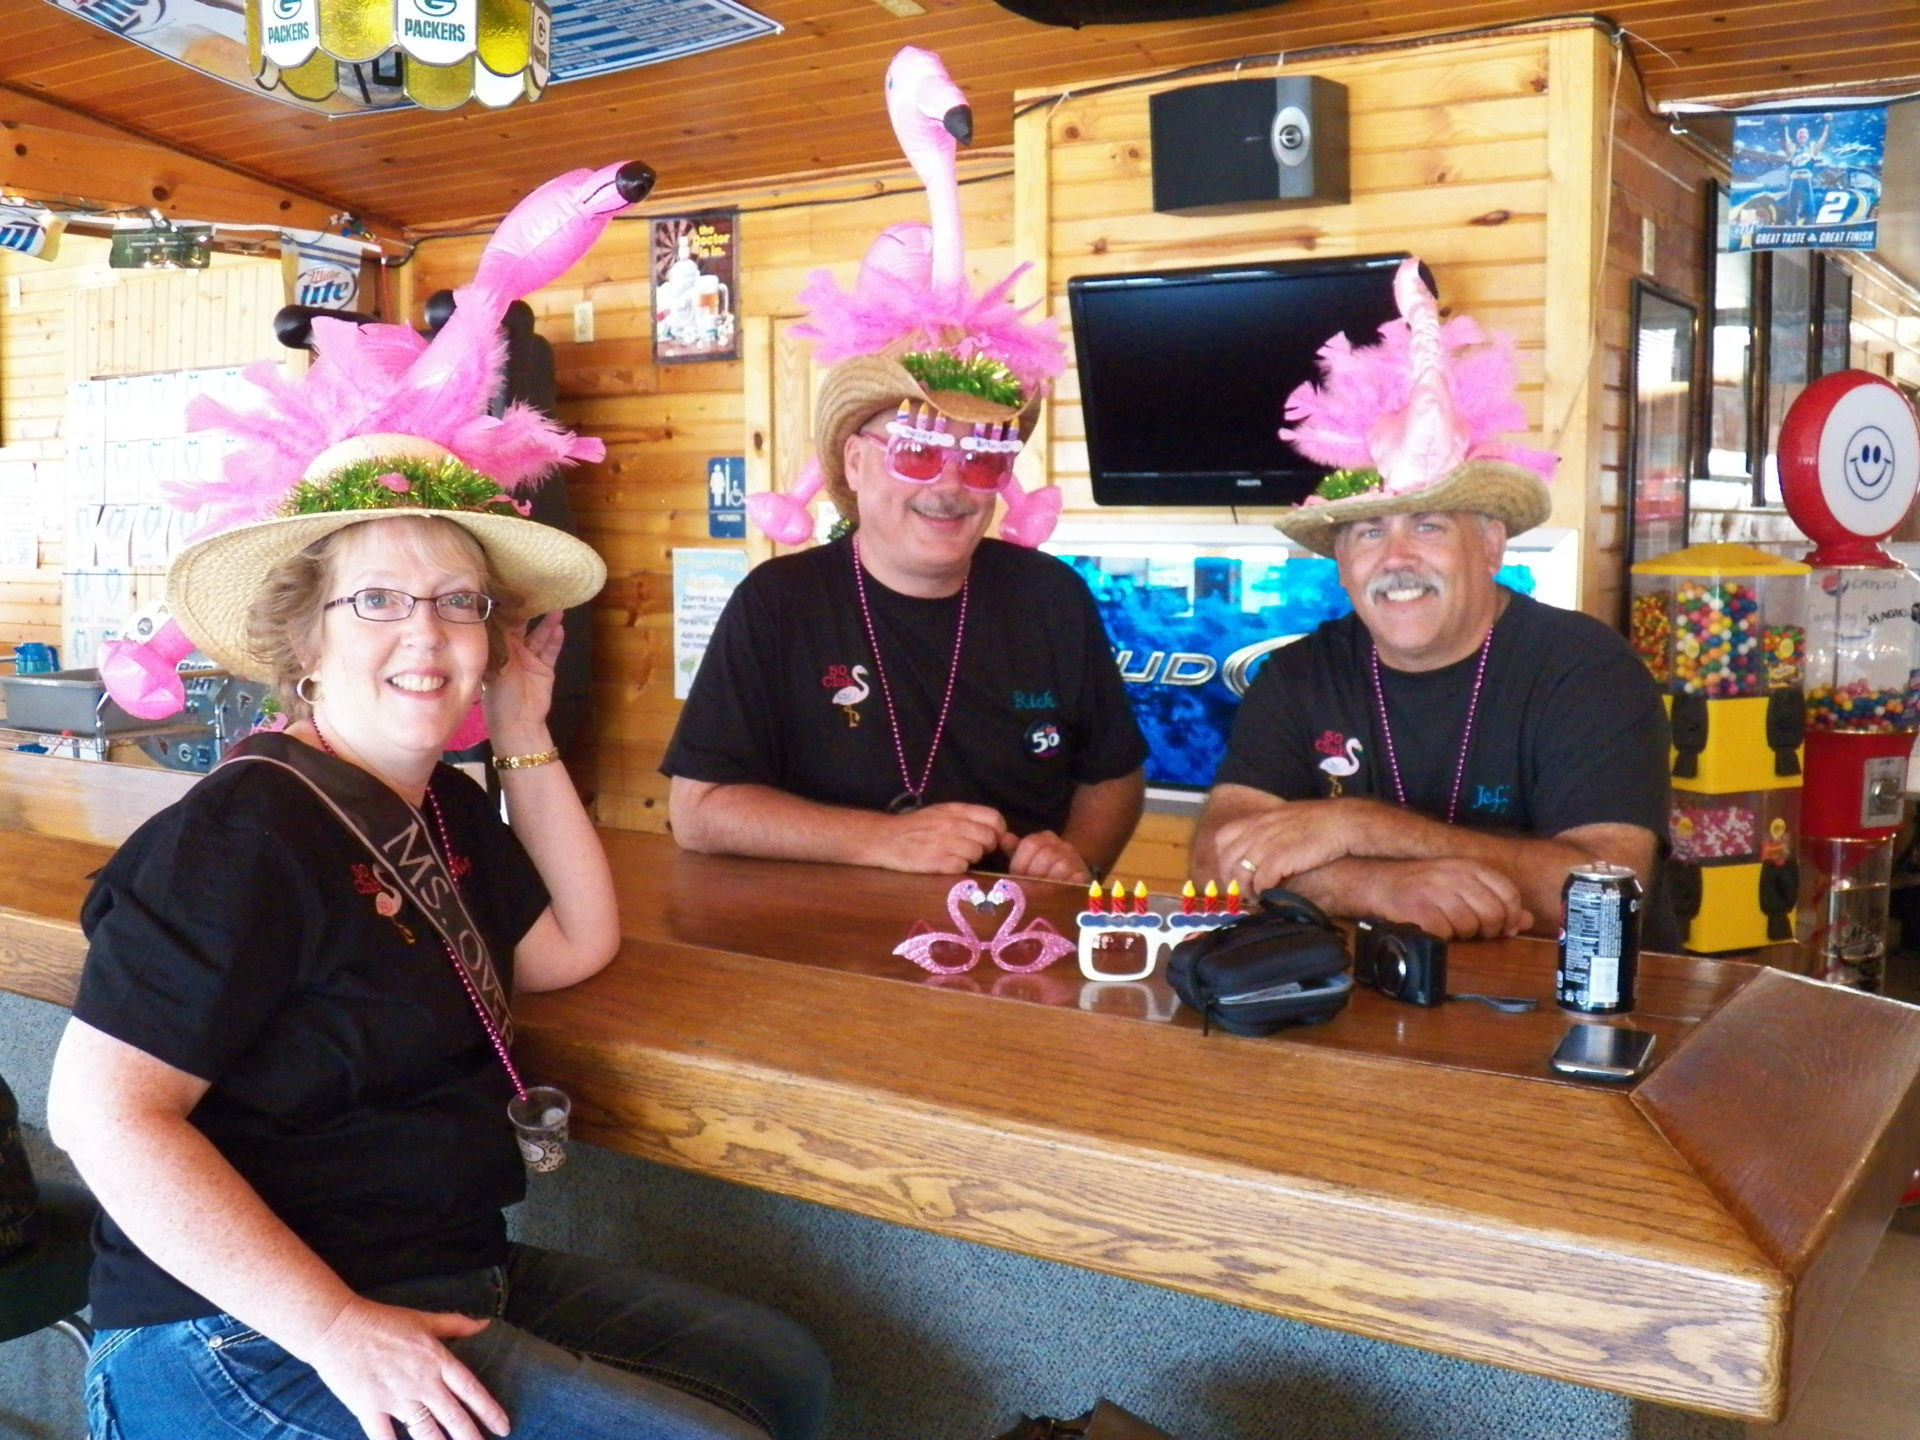 2012-09-15-three-bar-patrons-wearing-pink-flamingo-hats